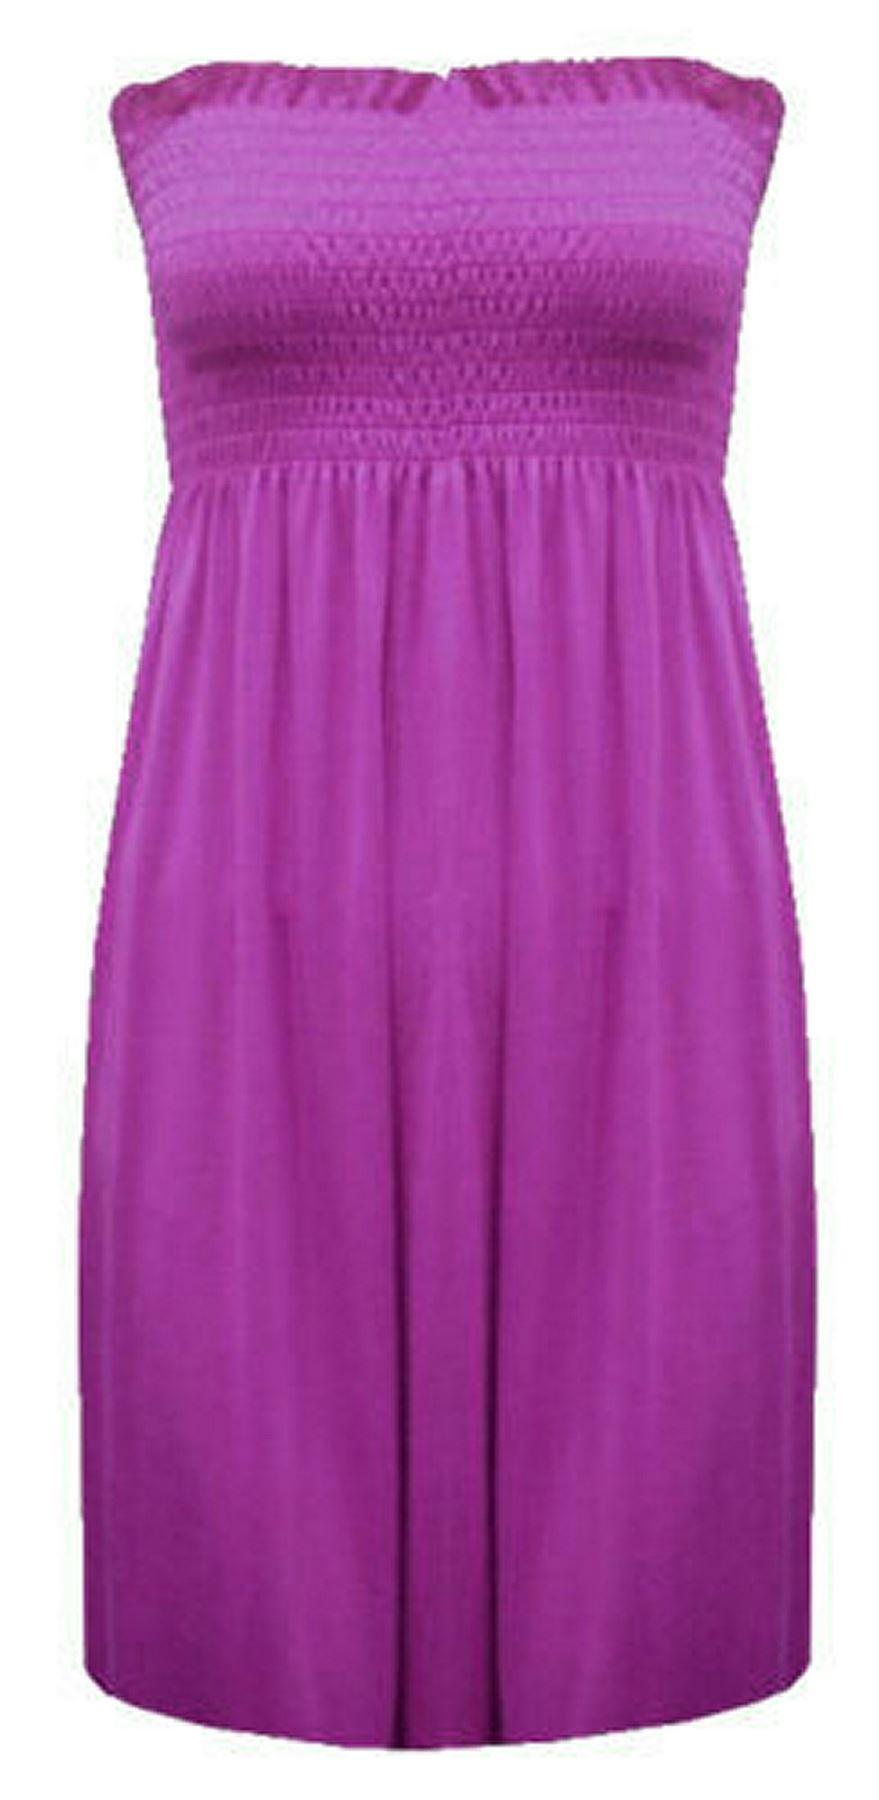 New-Ladies-Bandeau-Boob-Gathering-Tops-Boob-Tube-Beach-Wear-Tunics-8-26 thumbnail 57